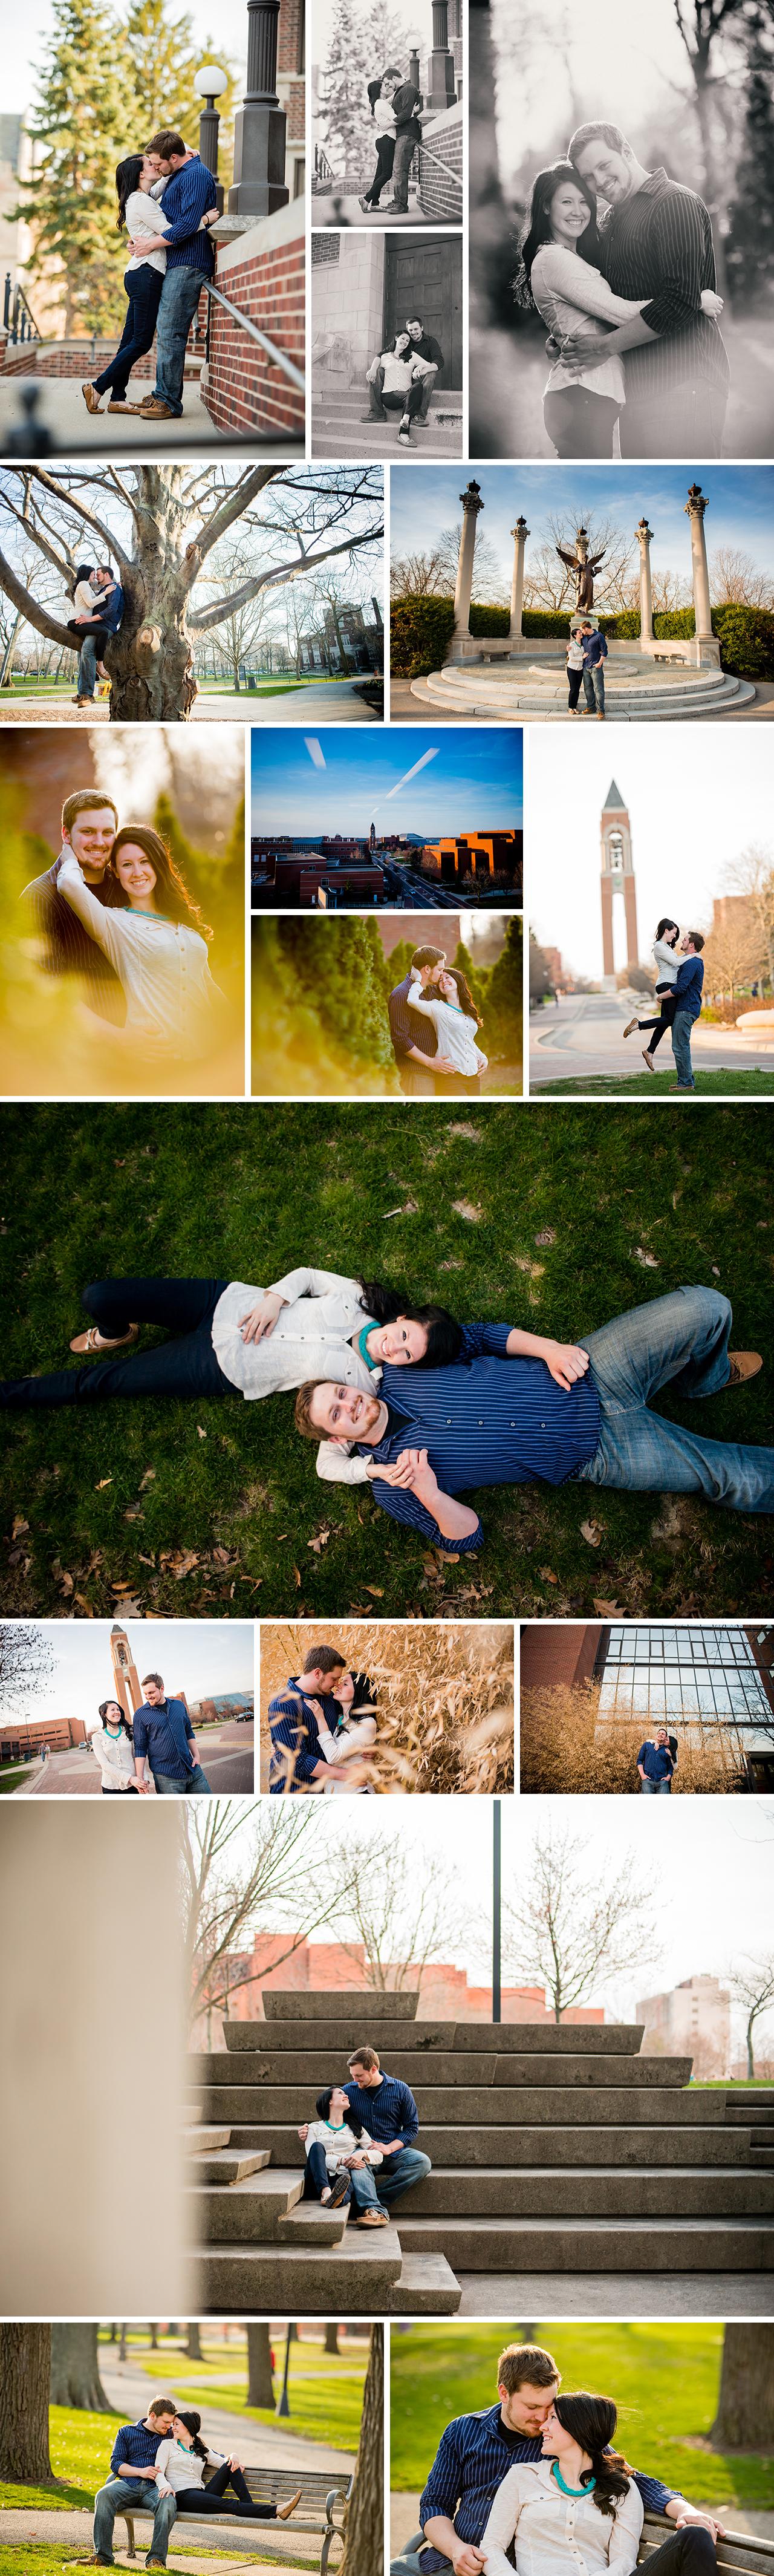 Blog Collage-1397609599806.jpg